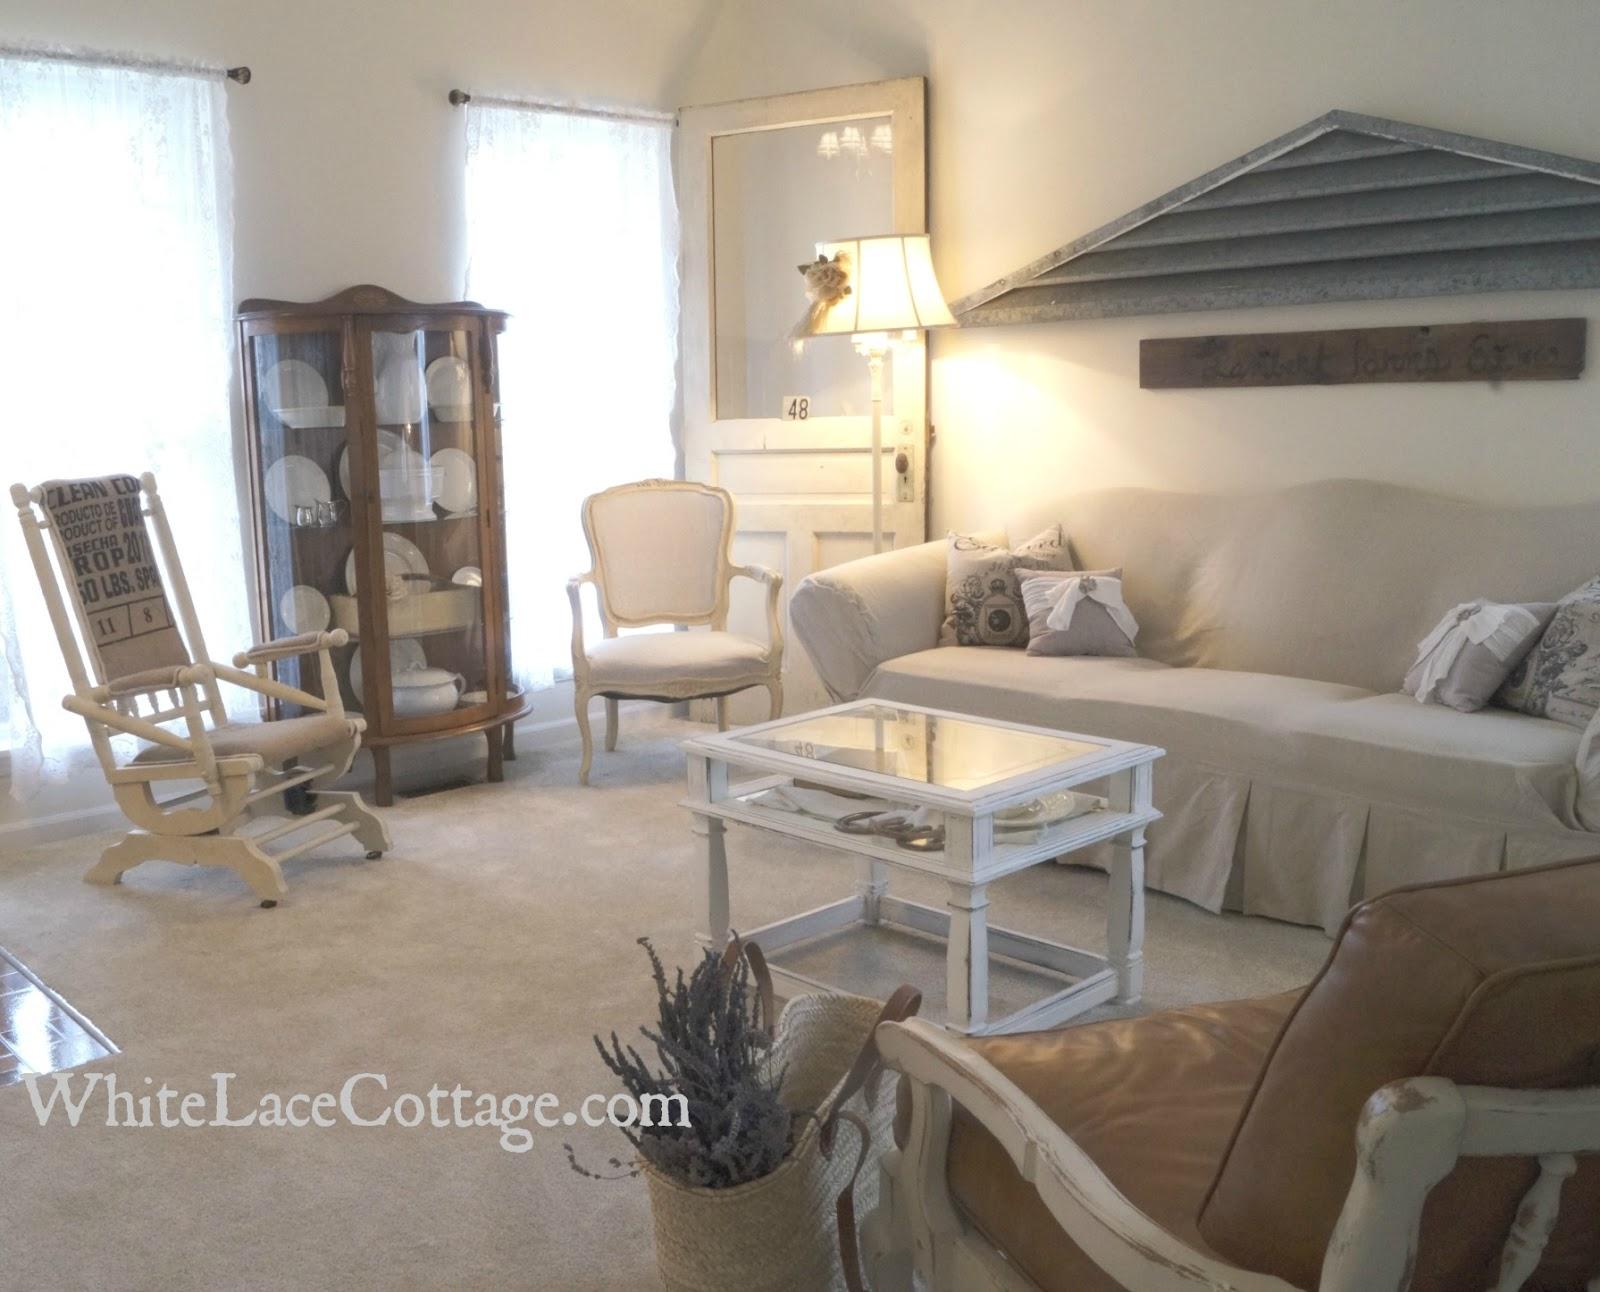 Wondrous Coffee Burlap Rocking Chair Reveal White Lace Cottage Download Free Architecture Designs Scobabritishbridgeorg